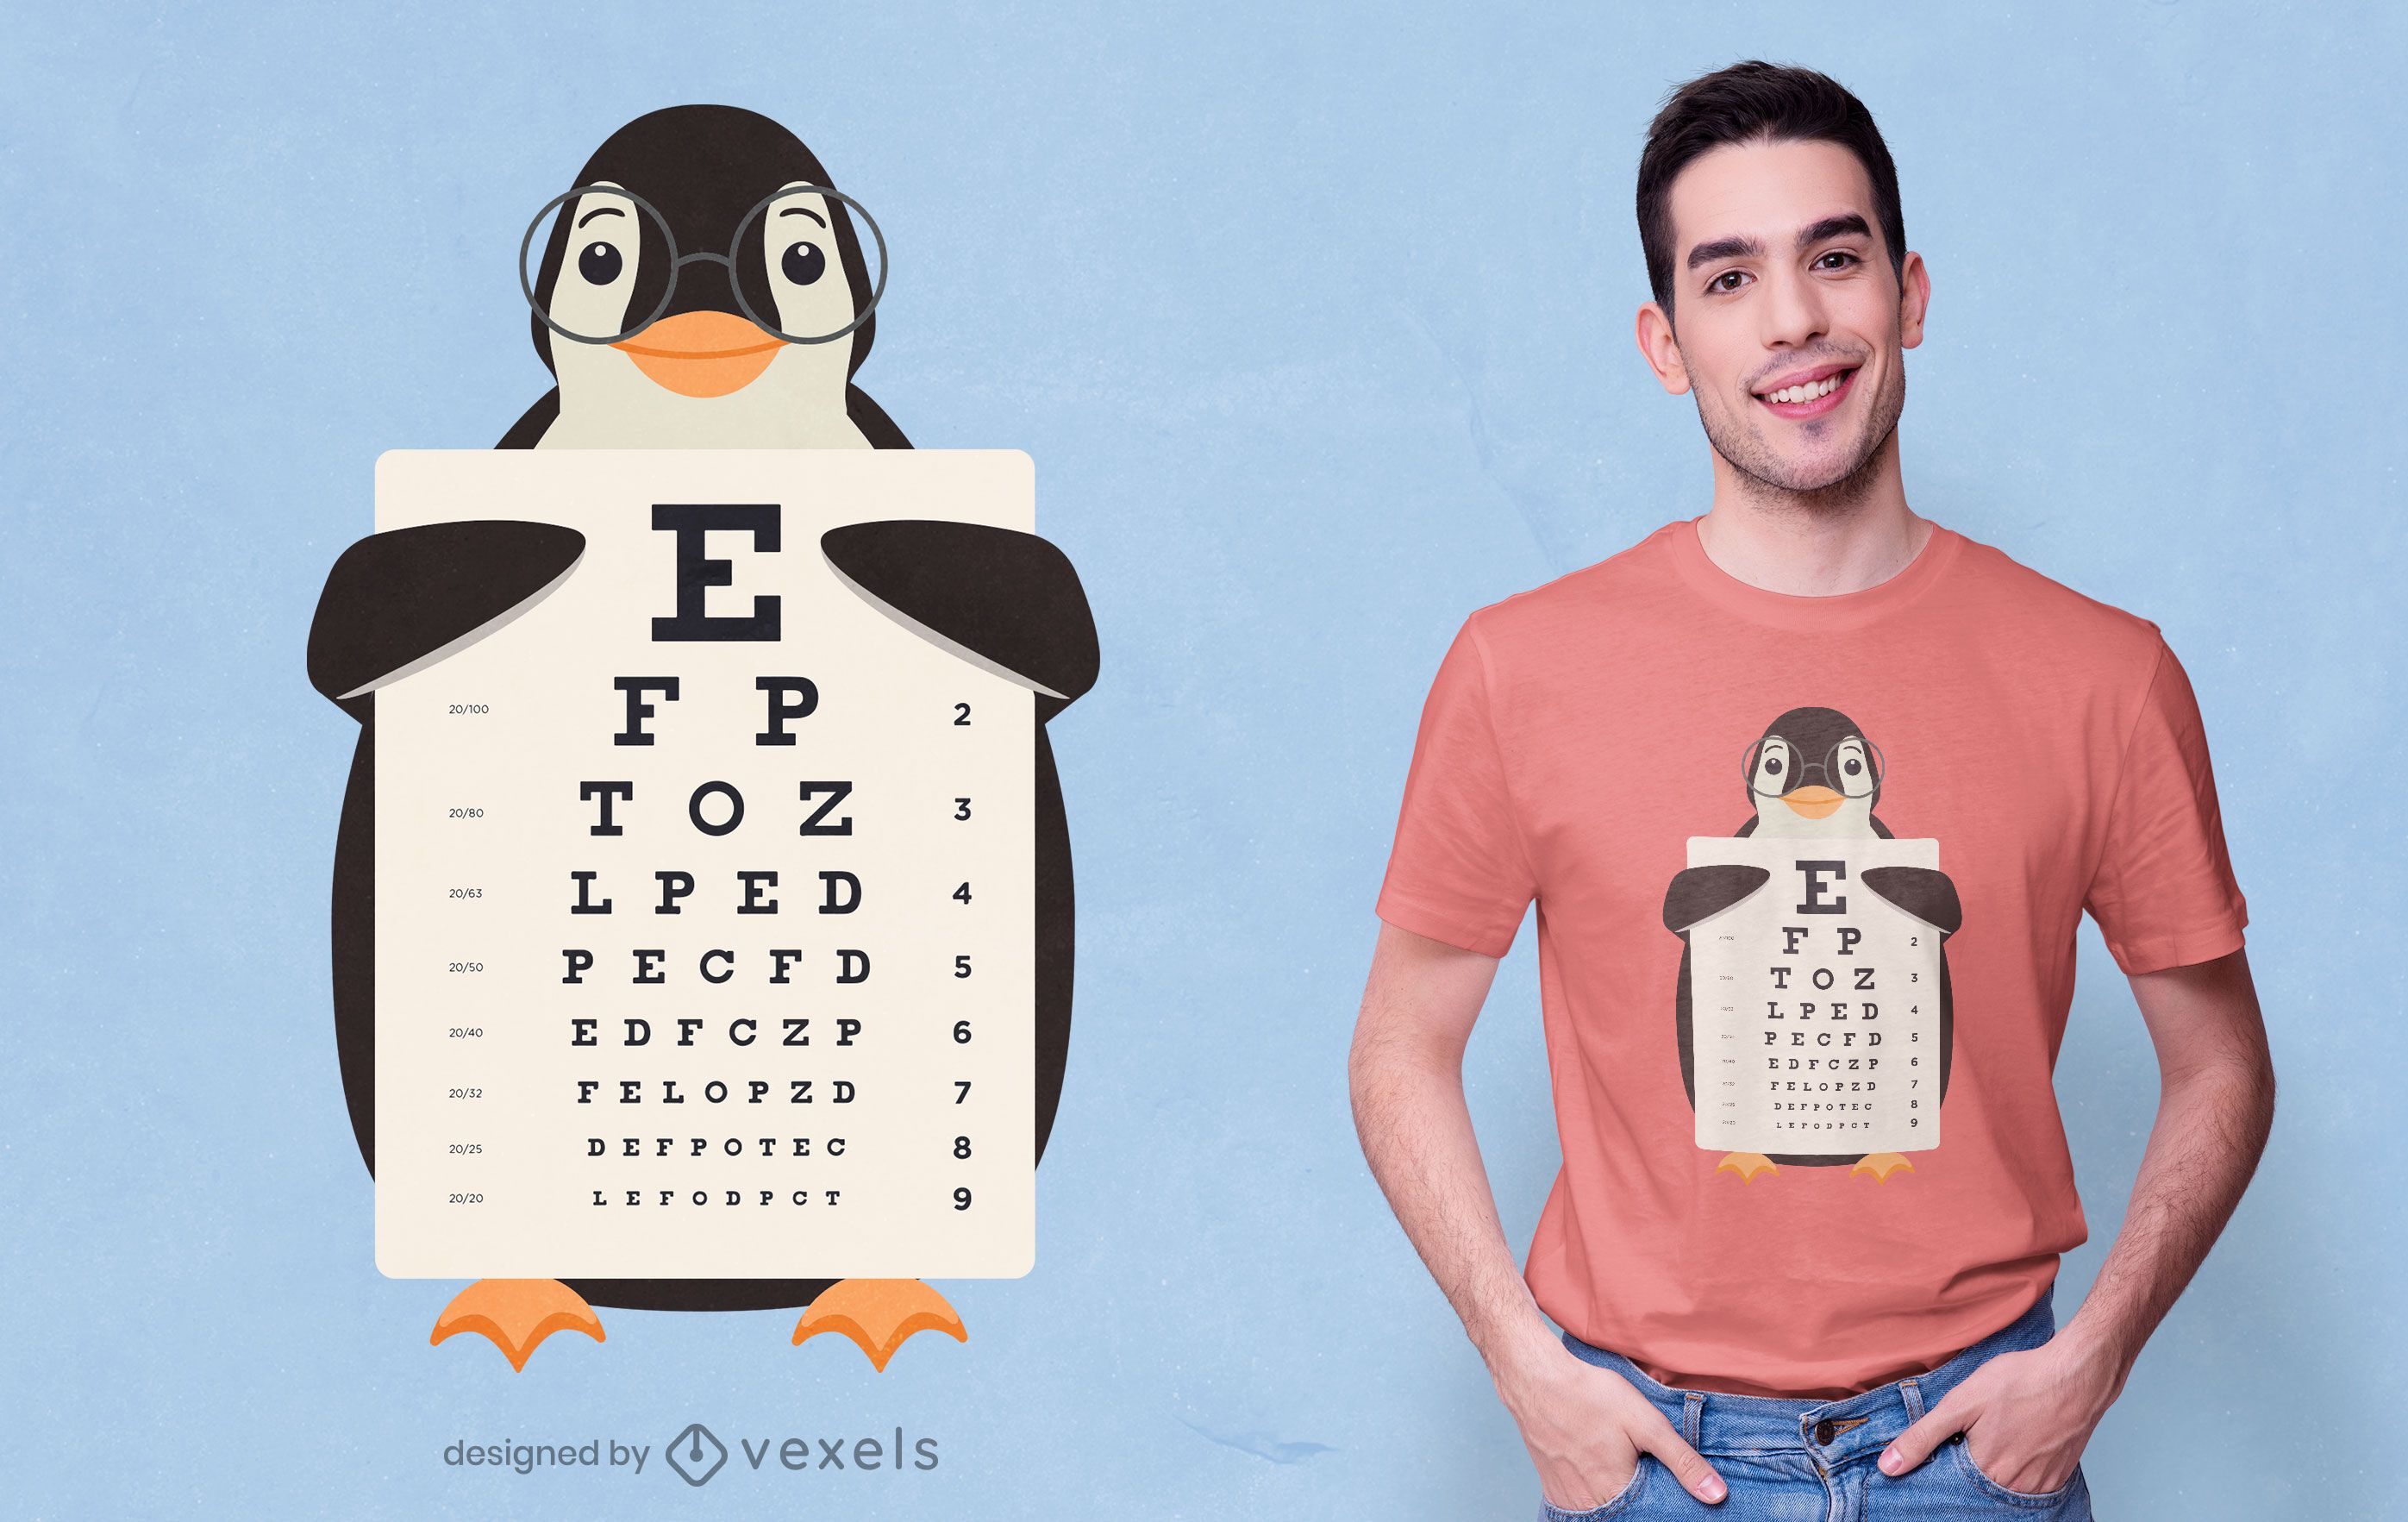 Pinguin-Augendiagramm-T-Shirt-Design